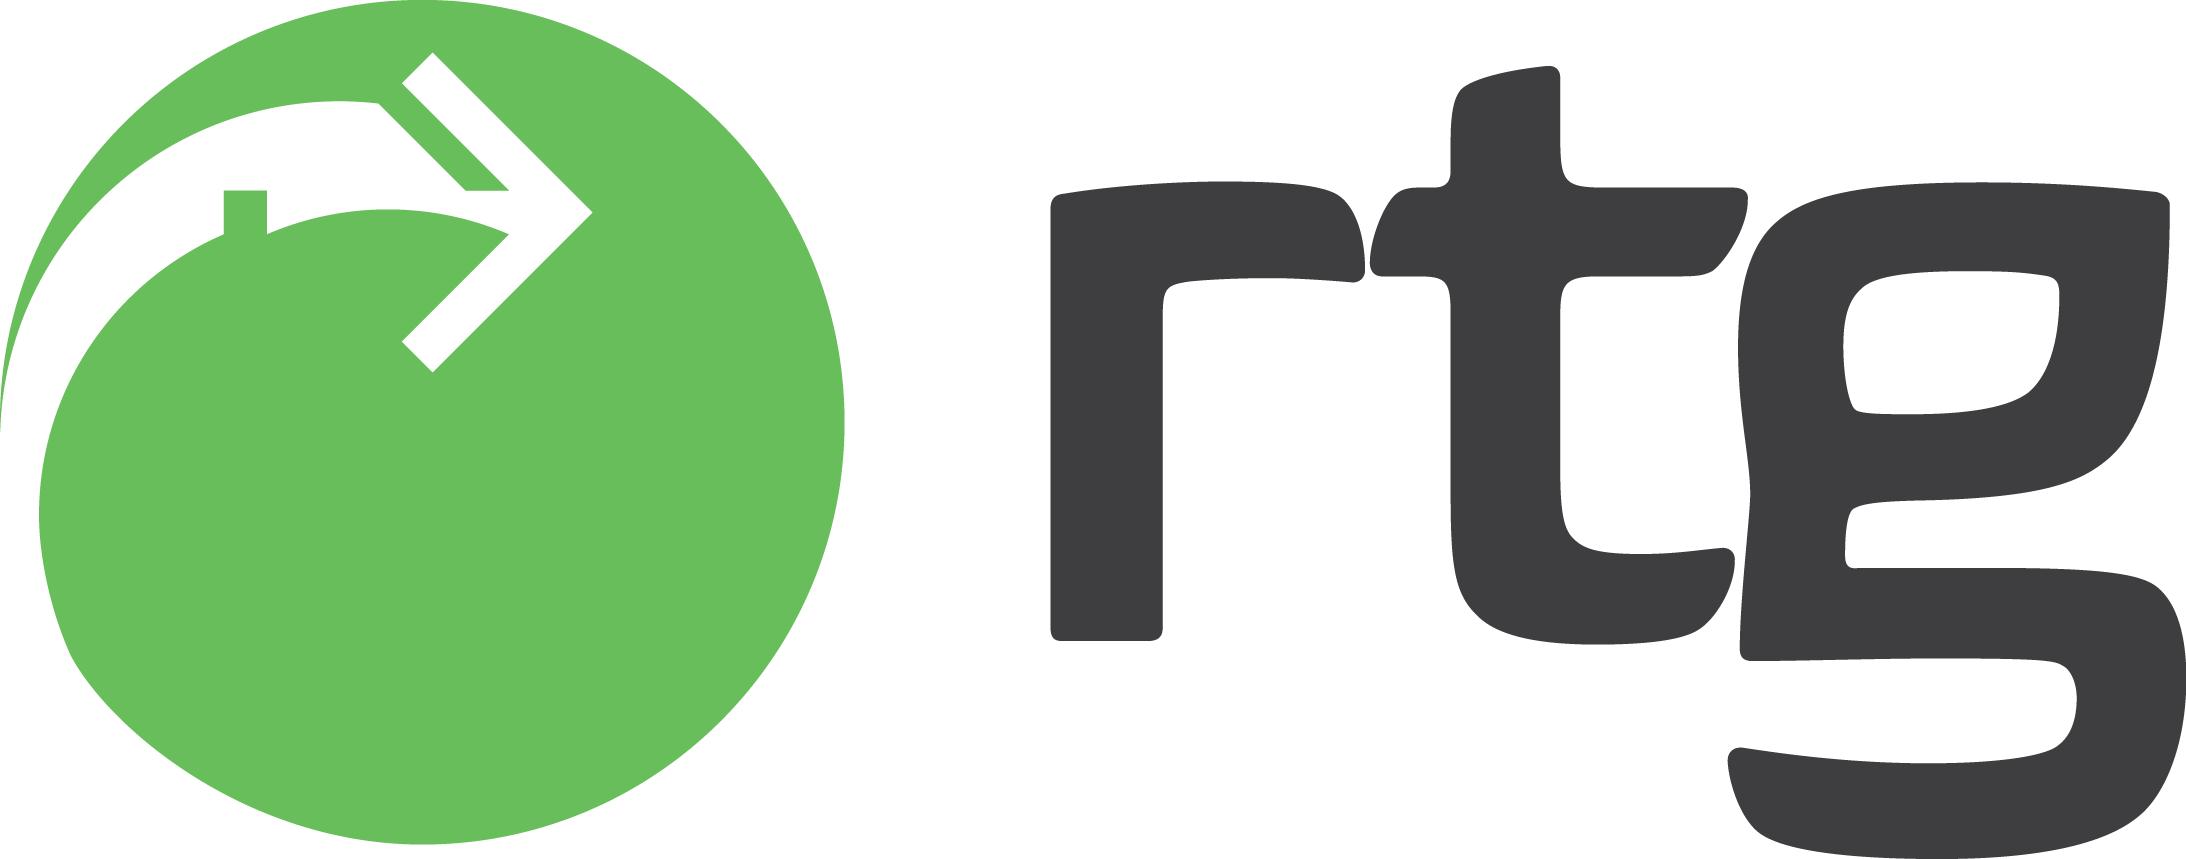 rtg_logo.png